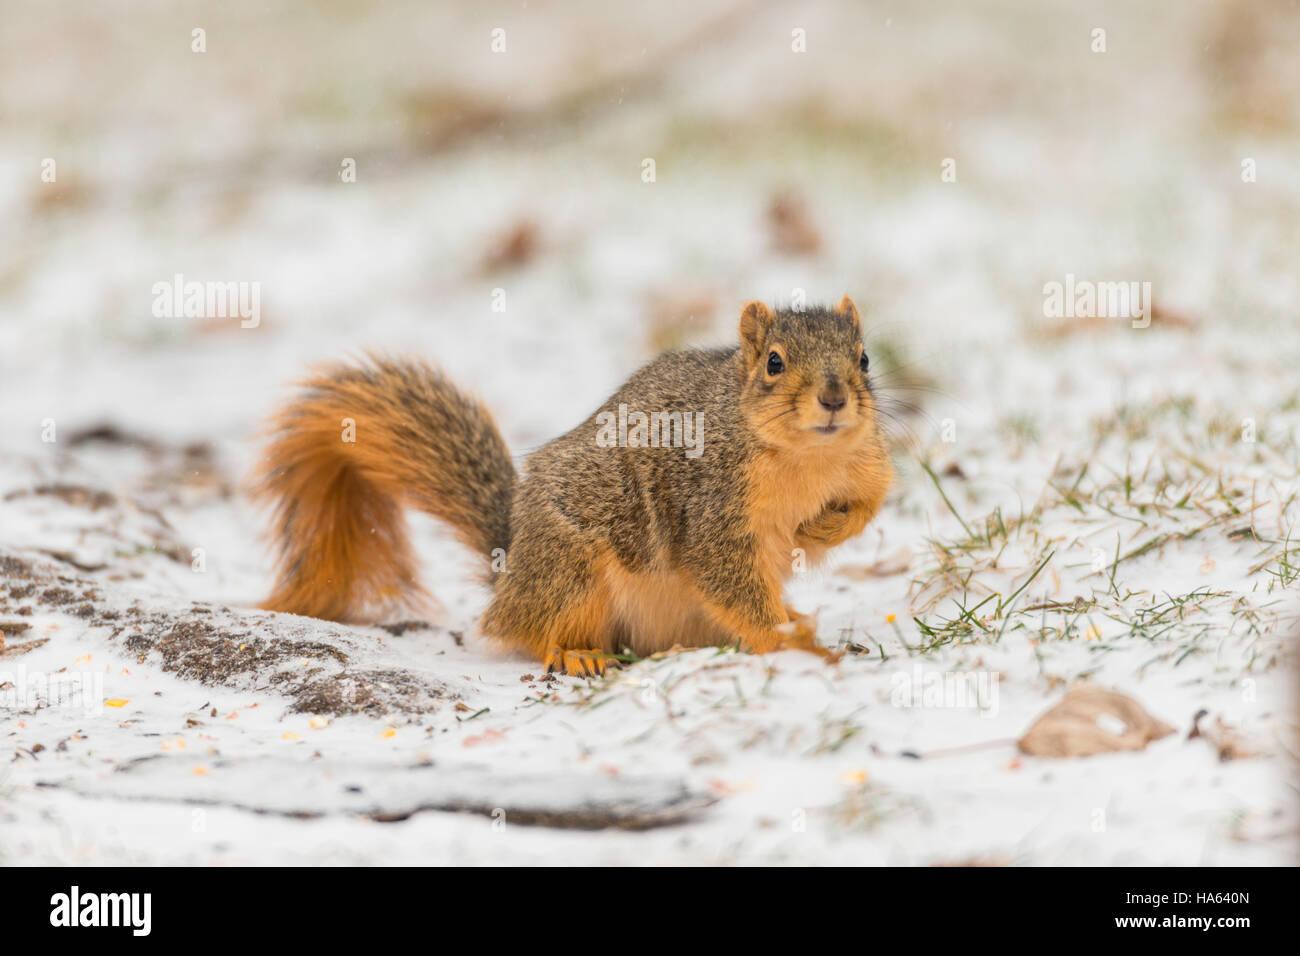 Fox Squirrel foraging on snowy ground. Stock Photo